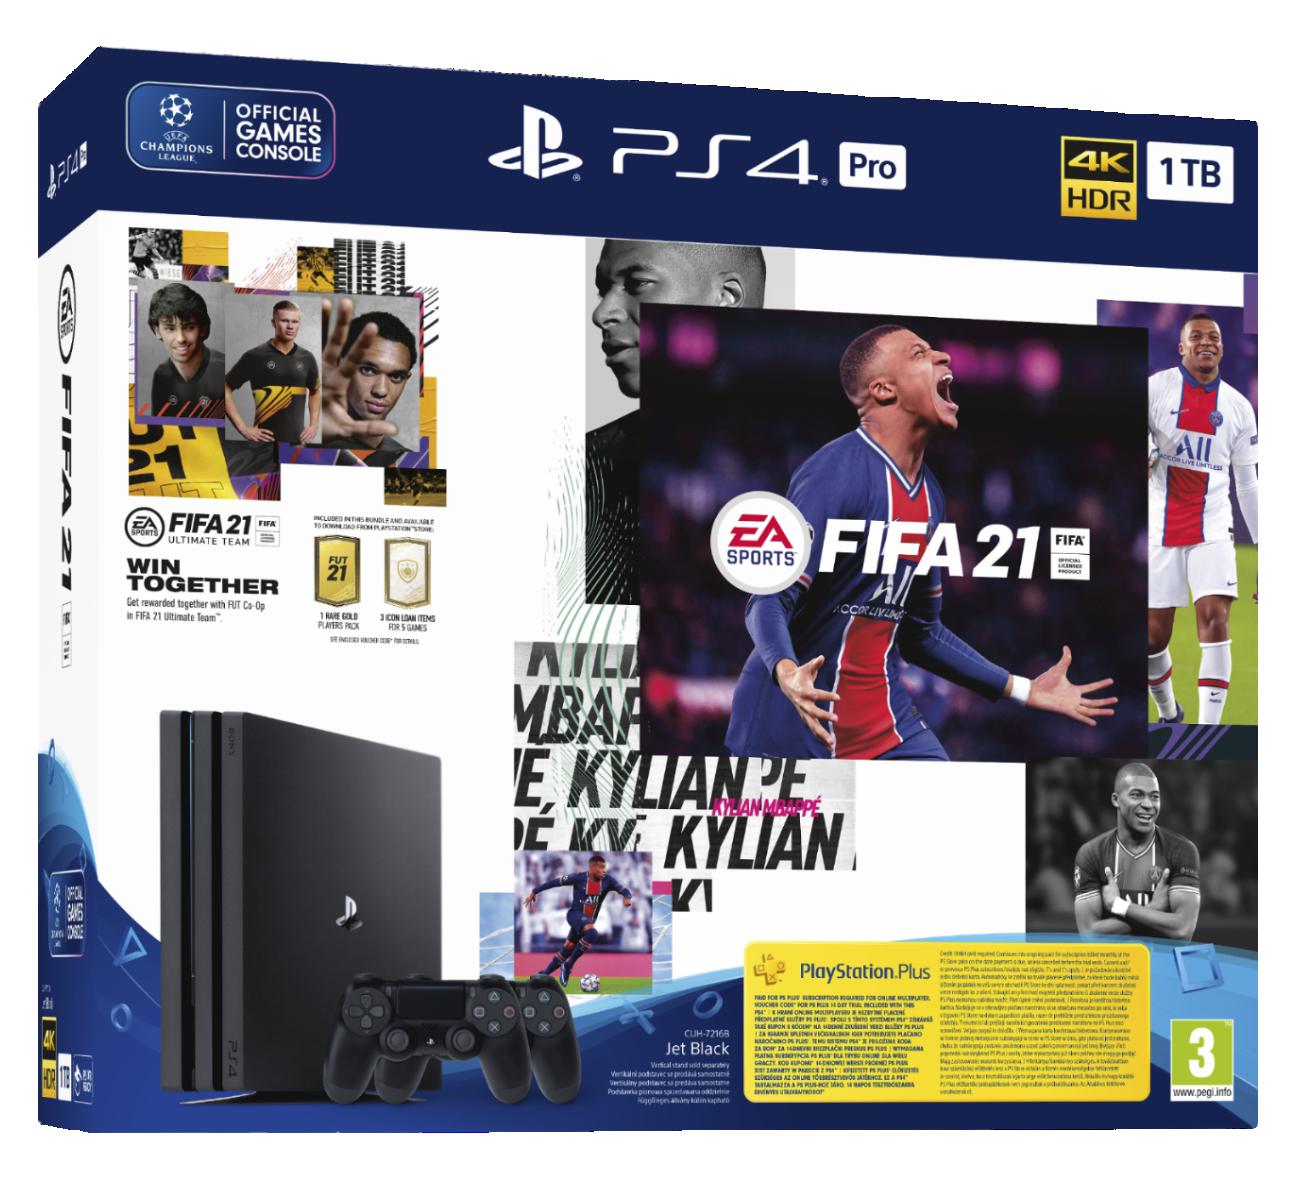 PS4 Pro 1TB + FIFA21 + 2x DS4